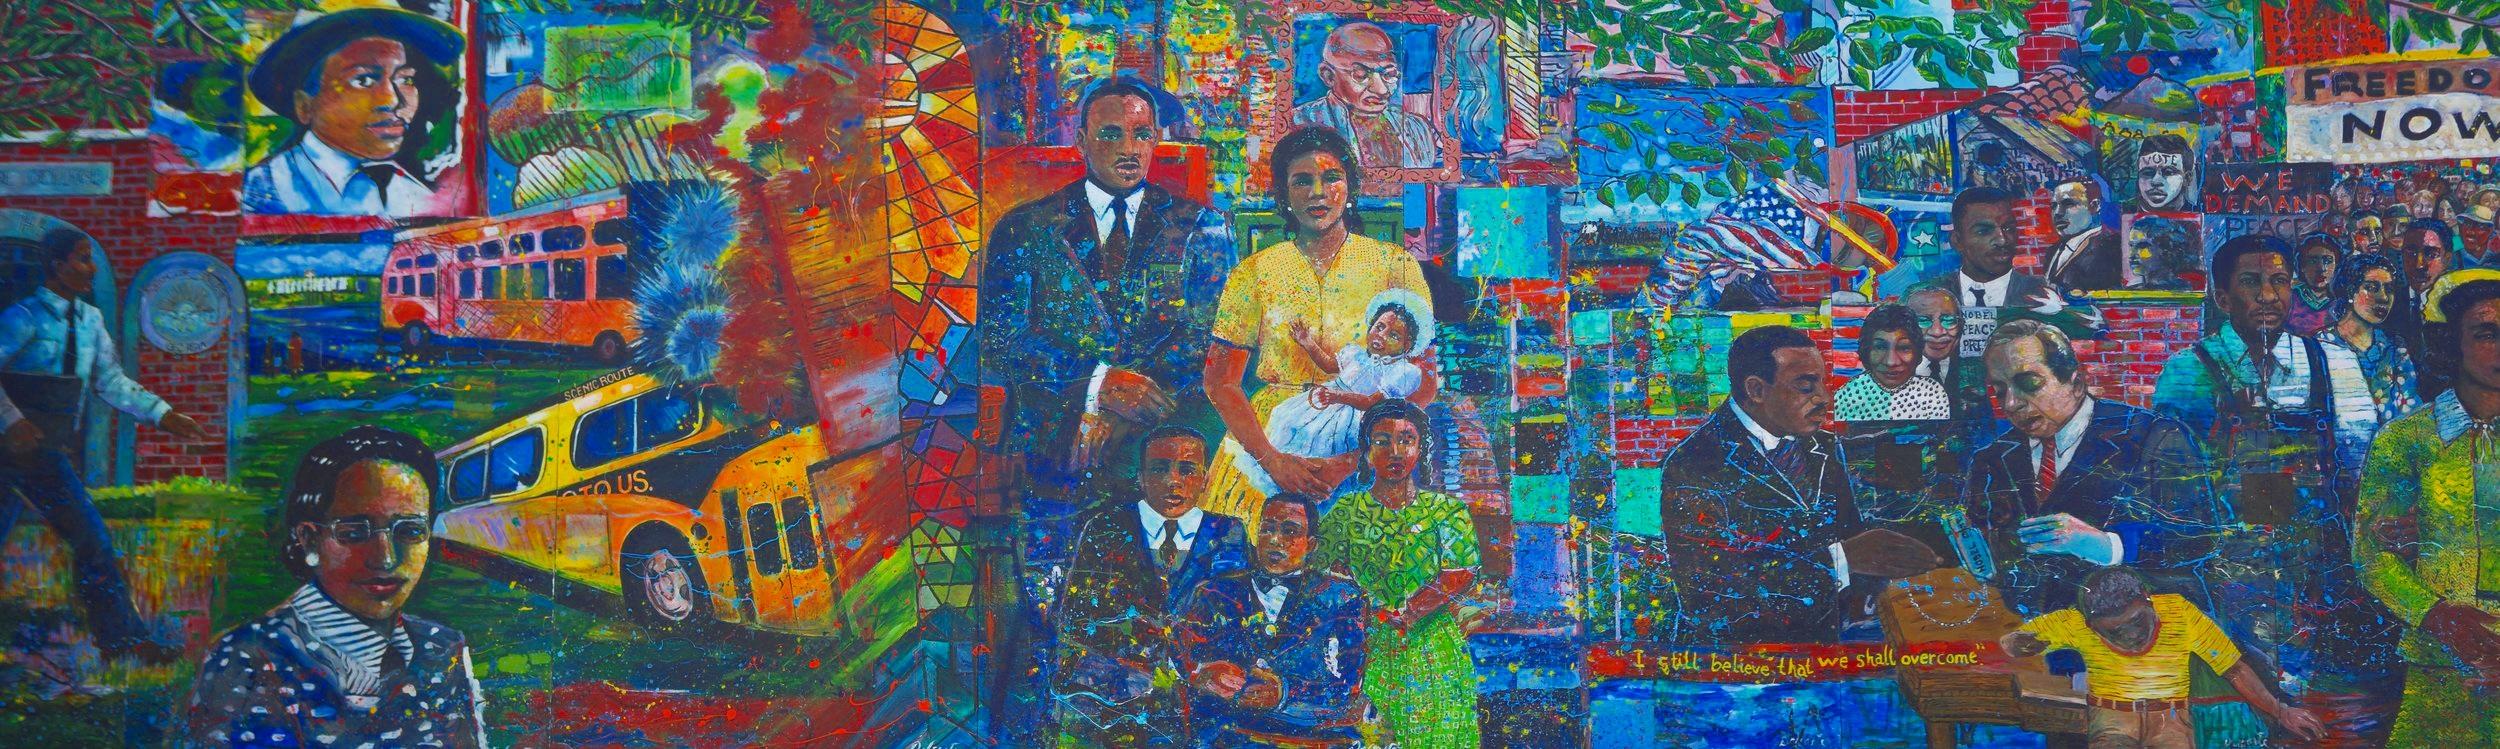 Civil Rights Mural, Atlanta, Georgia. Photo credit: Georgia USA